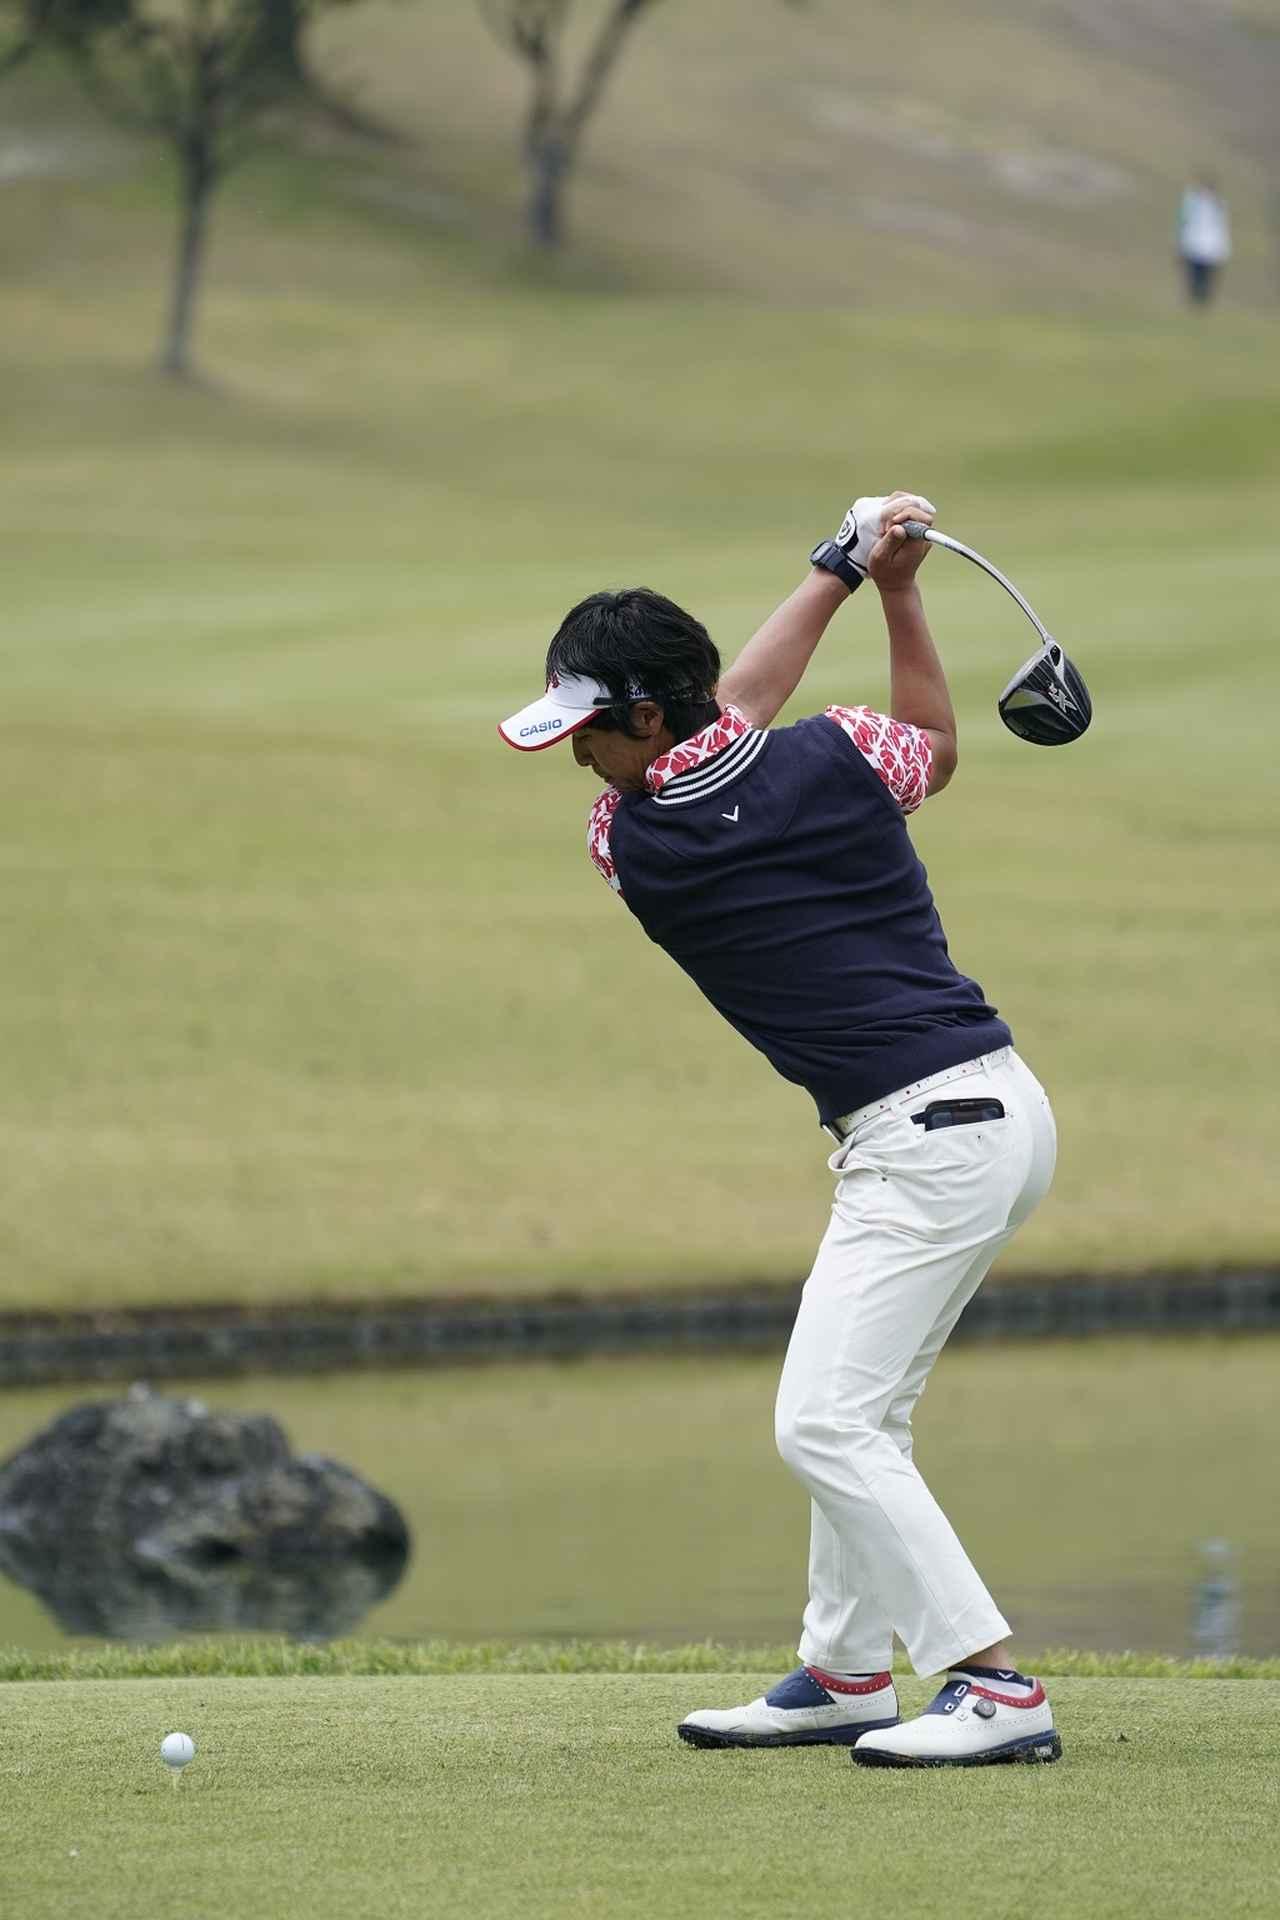 Images : 6番目の画像 - 石川遼ドライバー前方連続写真 - みんなのゴルフダイジェスト